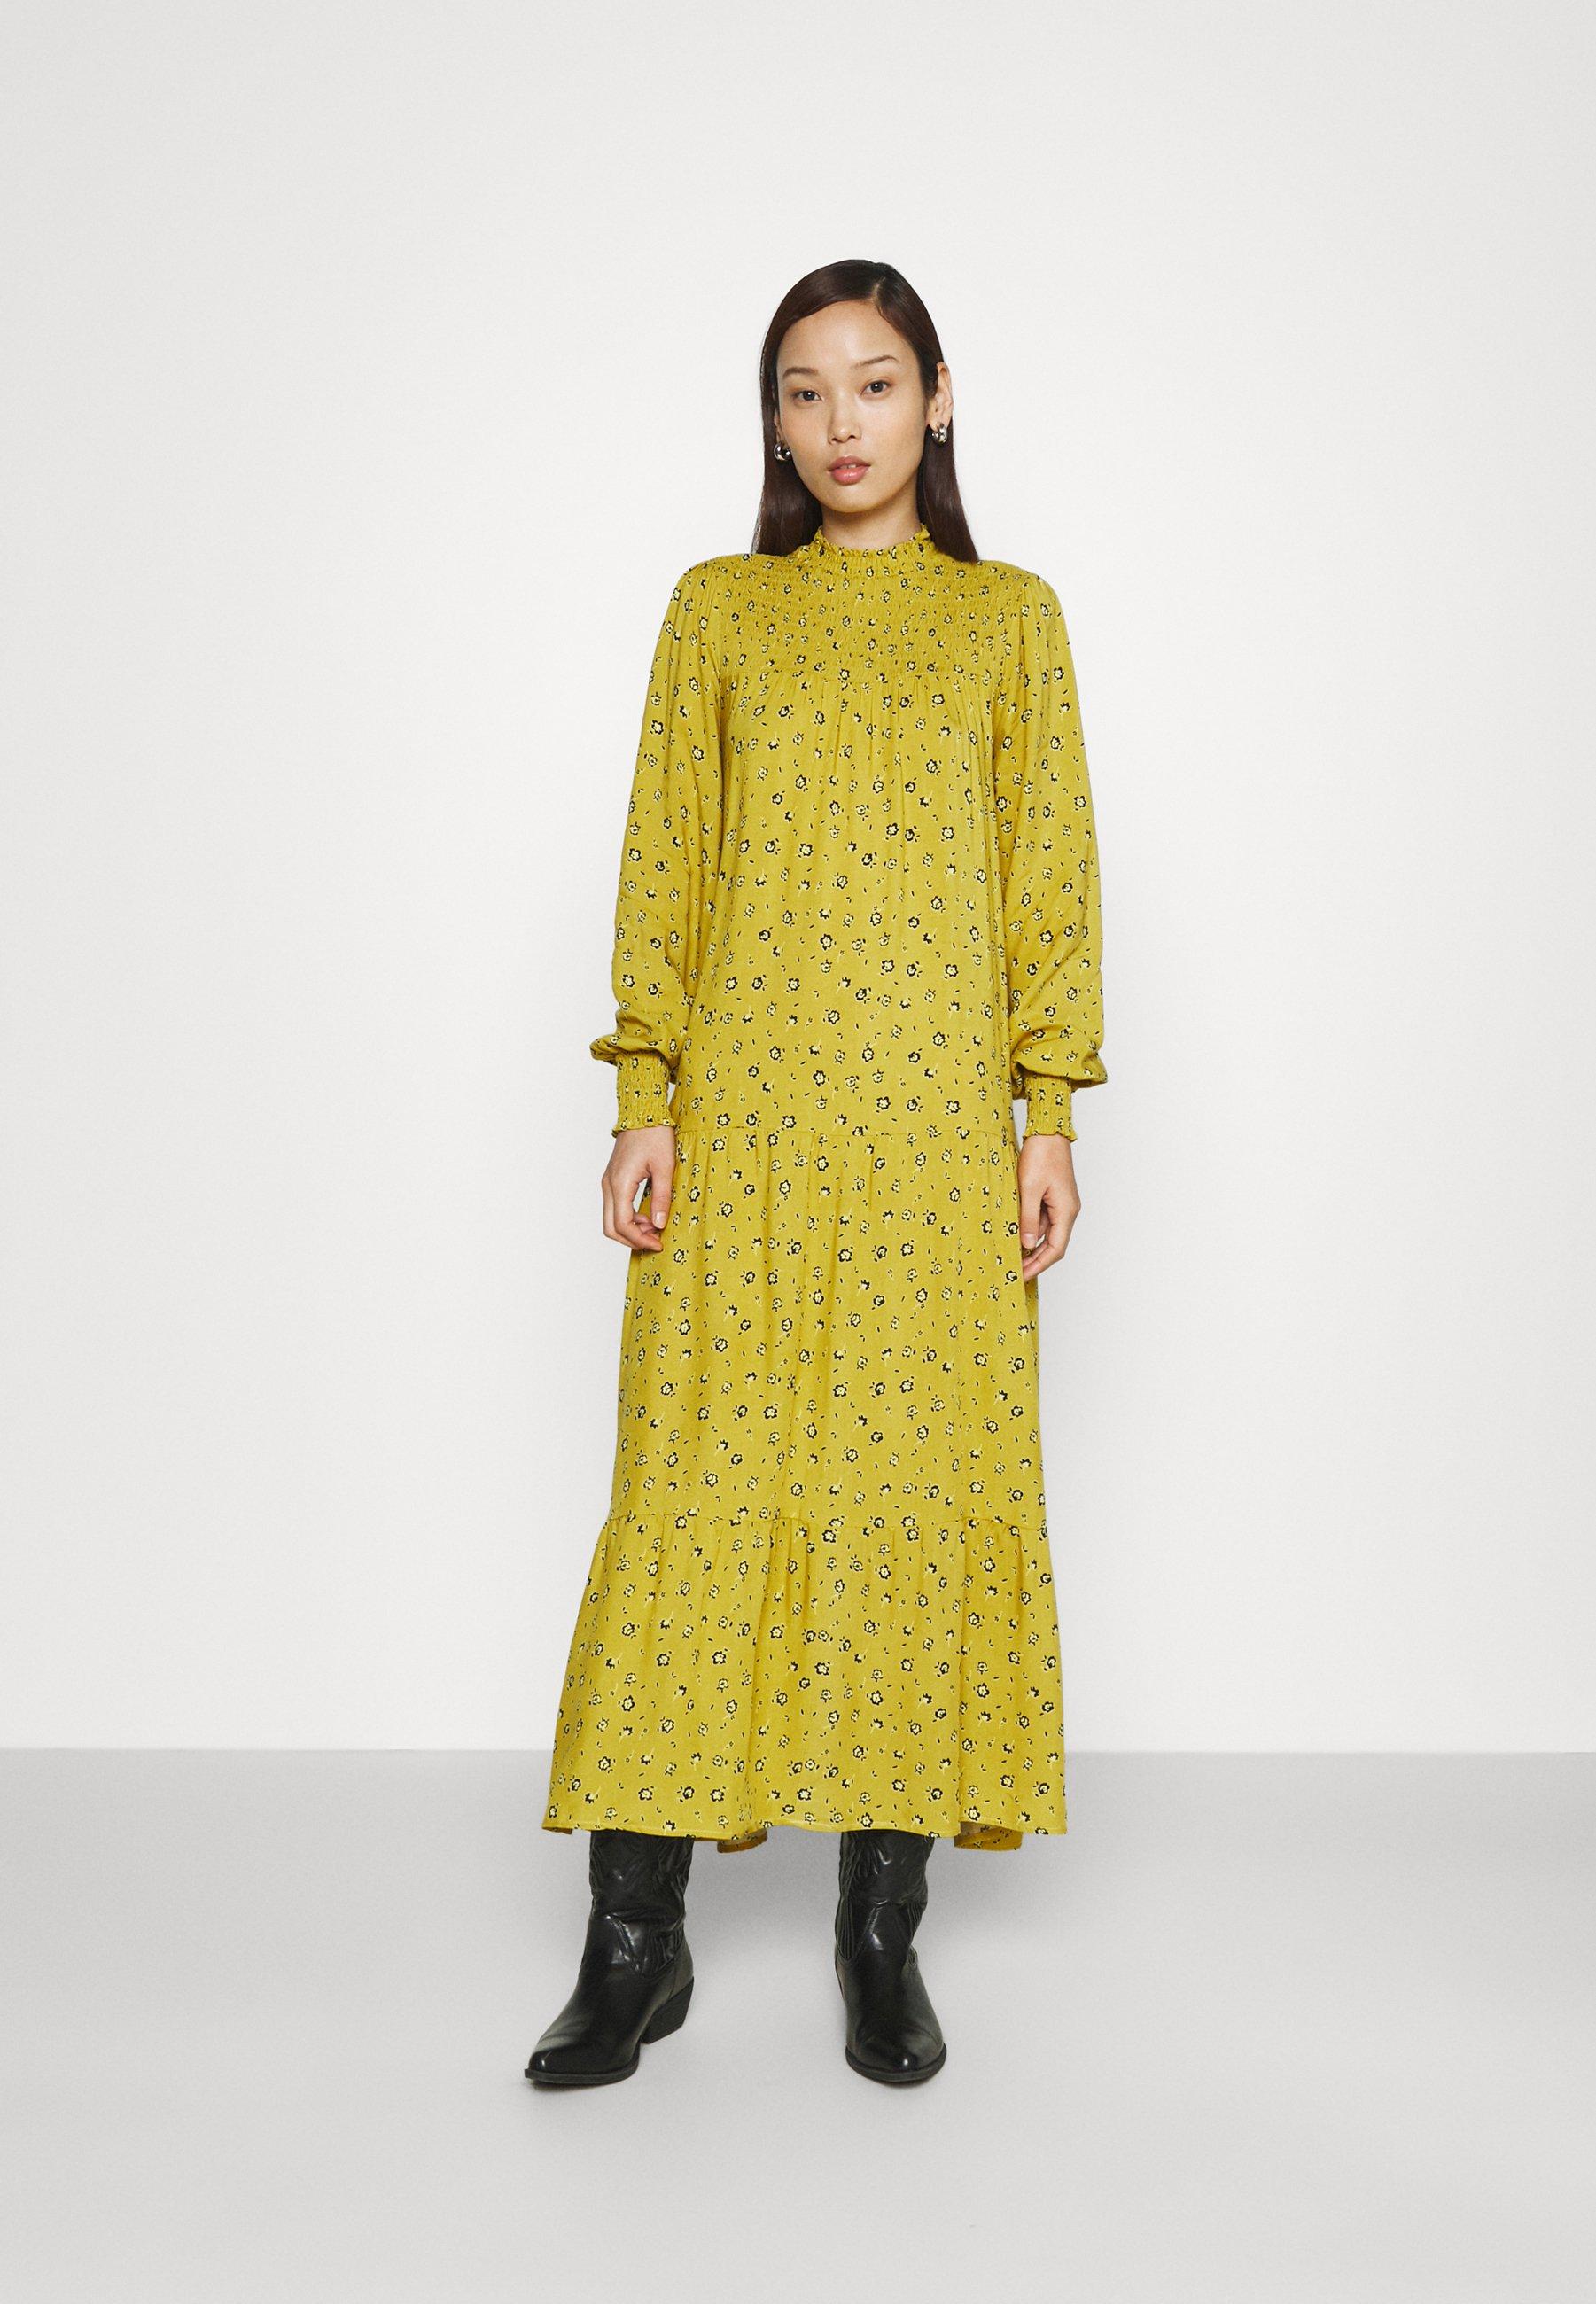 Women MODESTY MOCKED HIGH NECK MAI DRESSES WITH LONG SLEEVES - Maxi dress